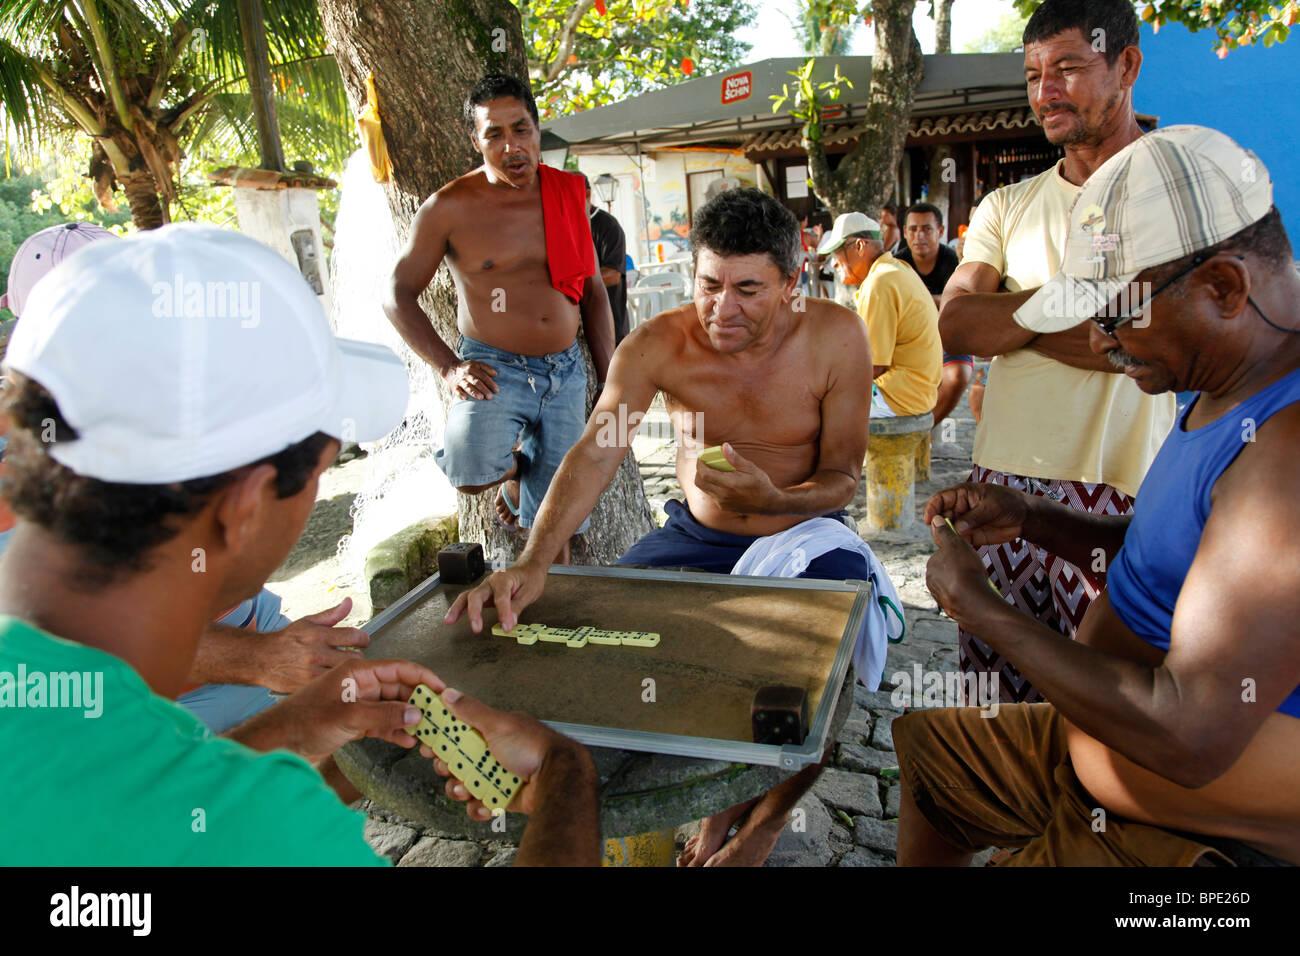 Men playing domino, Porto Seguro, Bahia, Brazil - Stock Image